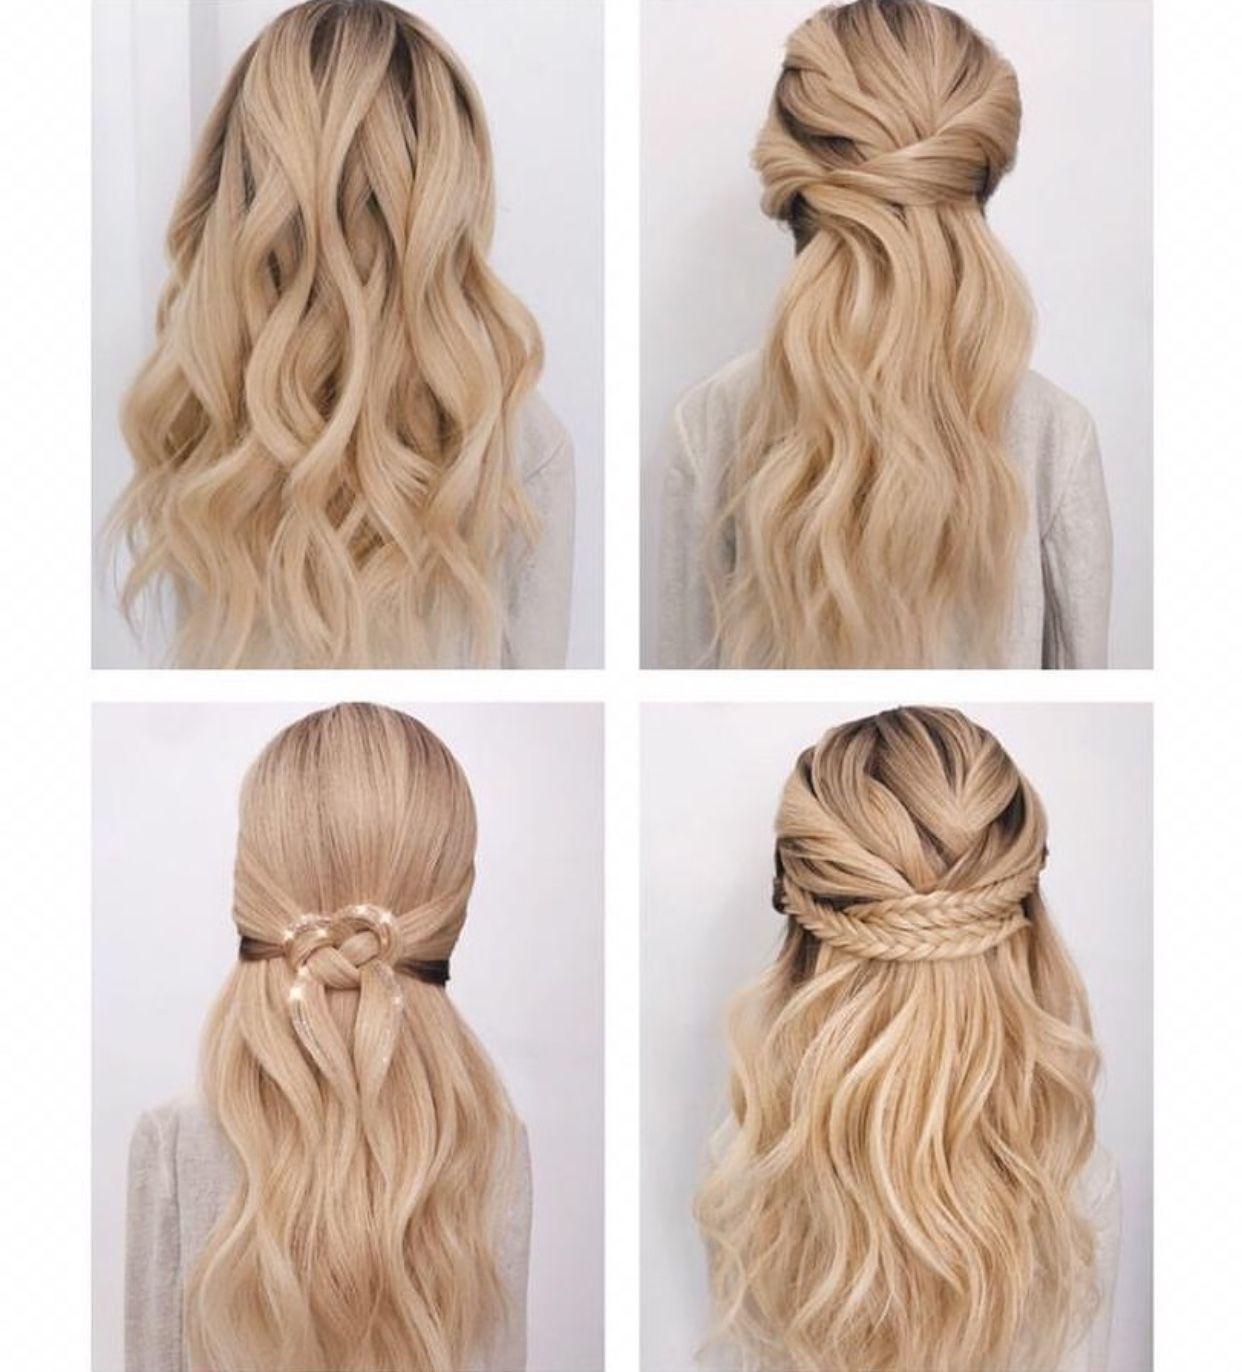 Diy Wedding Guest Hair: Pin By Lynette Tee On Hair Pictorial